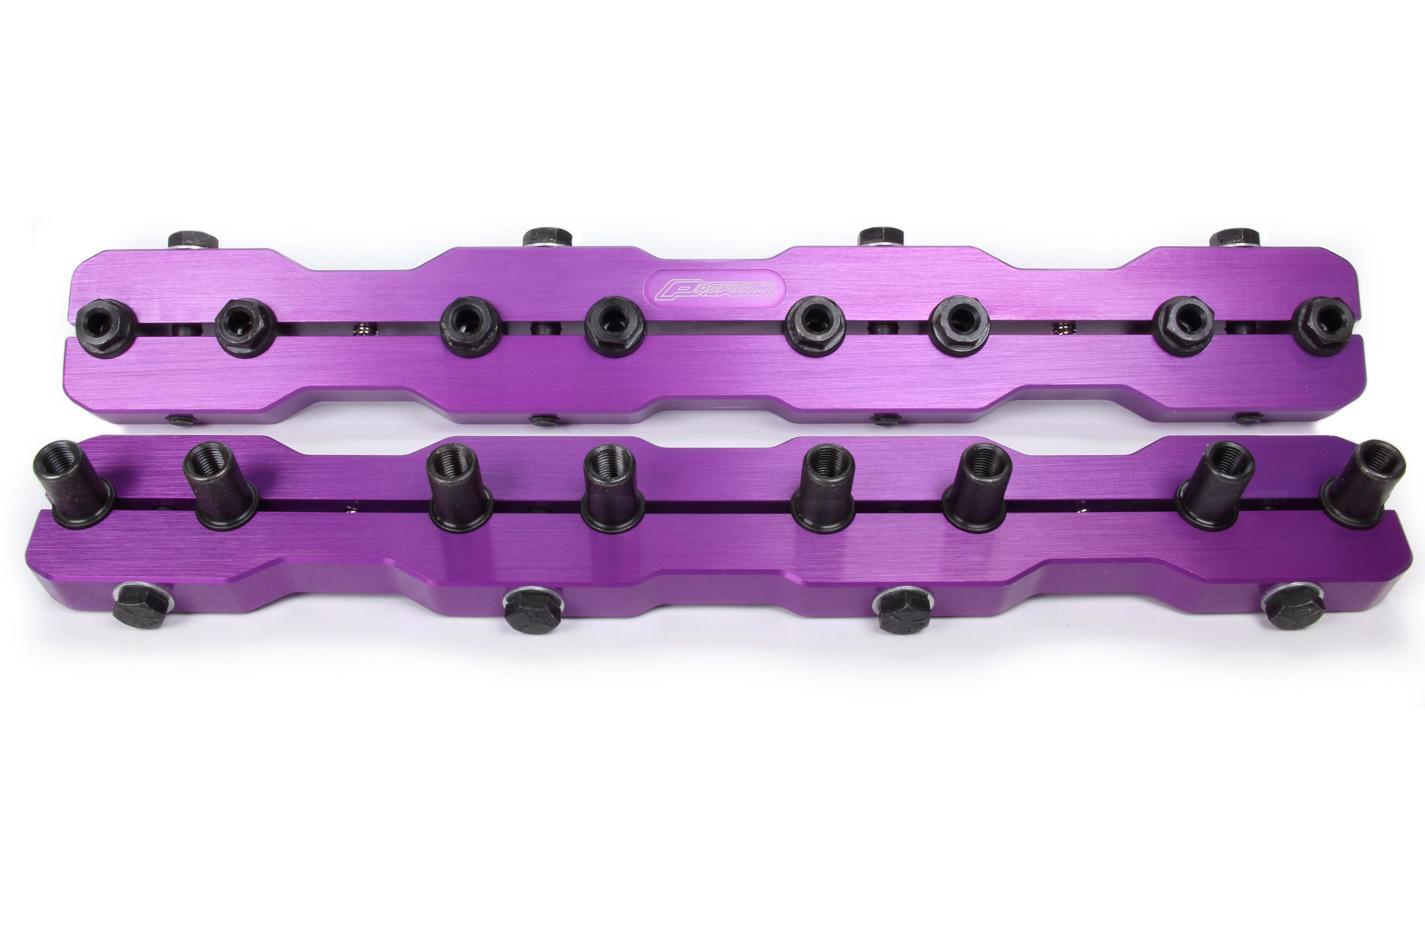 Proform 66951 Rocker Arm Stud Girdle, 7/16-16 in Thread Studs, Aluminum, Purple Anodized, Small Block Chevy, Kit